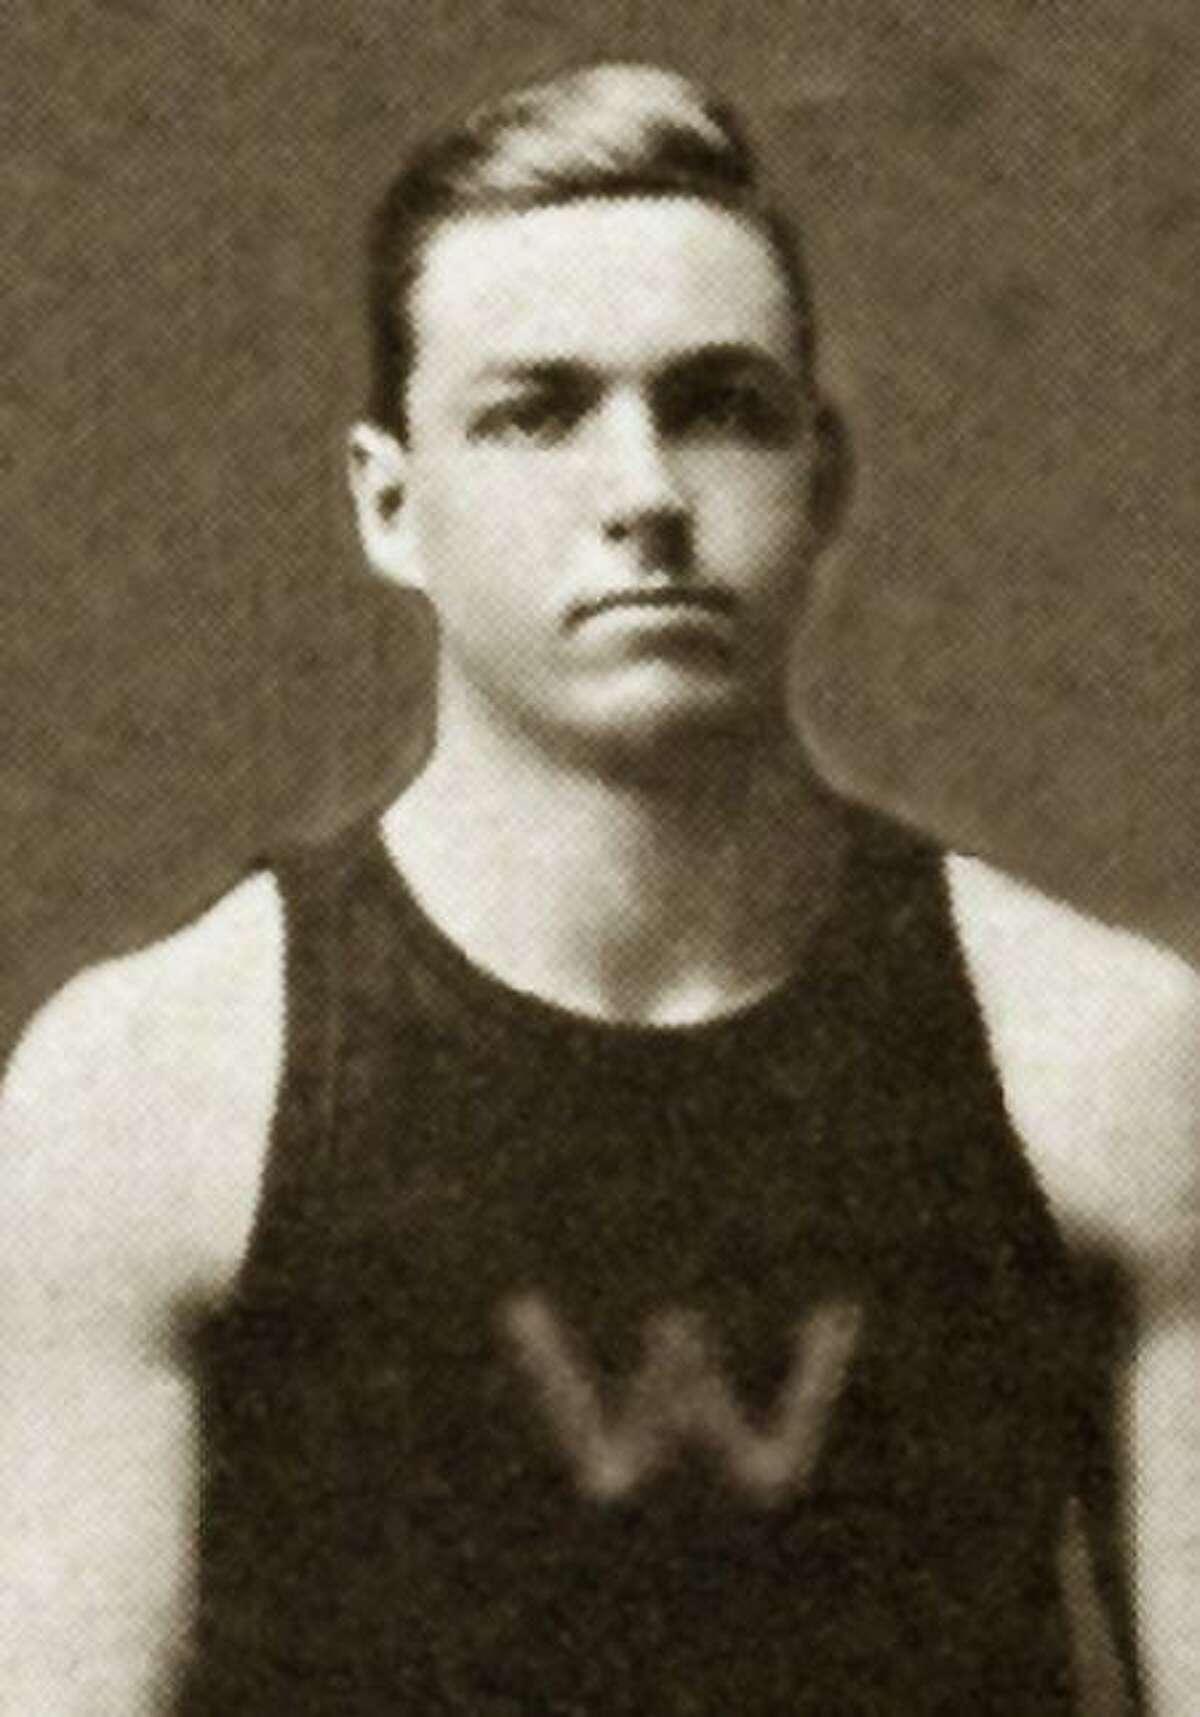 James Wendell hurdling at the 1912 Olympics in Stockholm, Sweden.